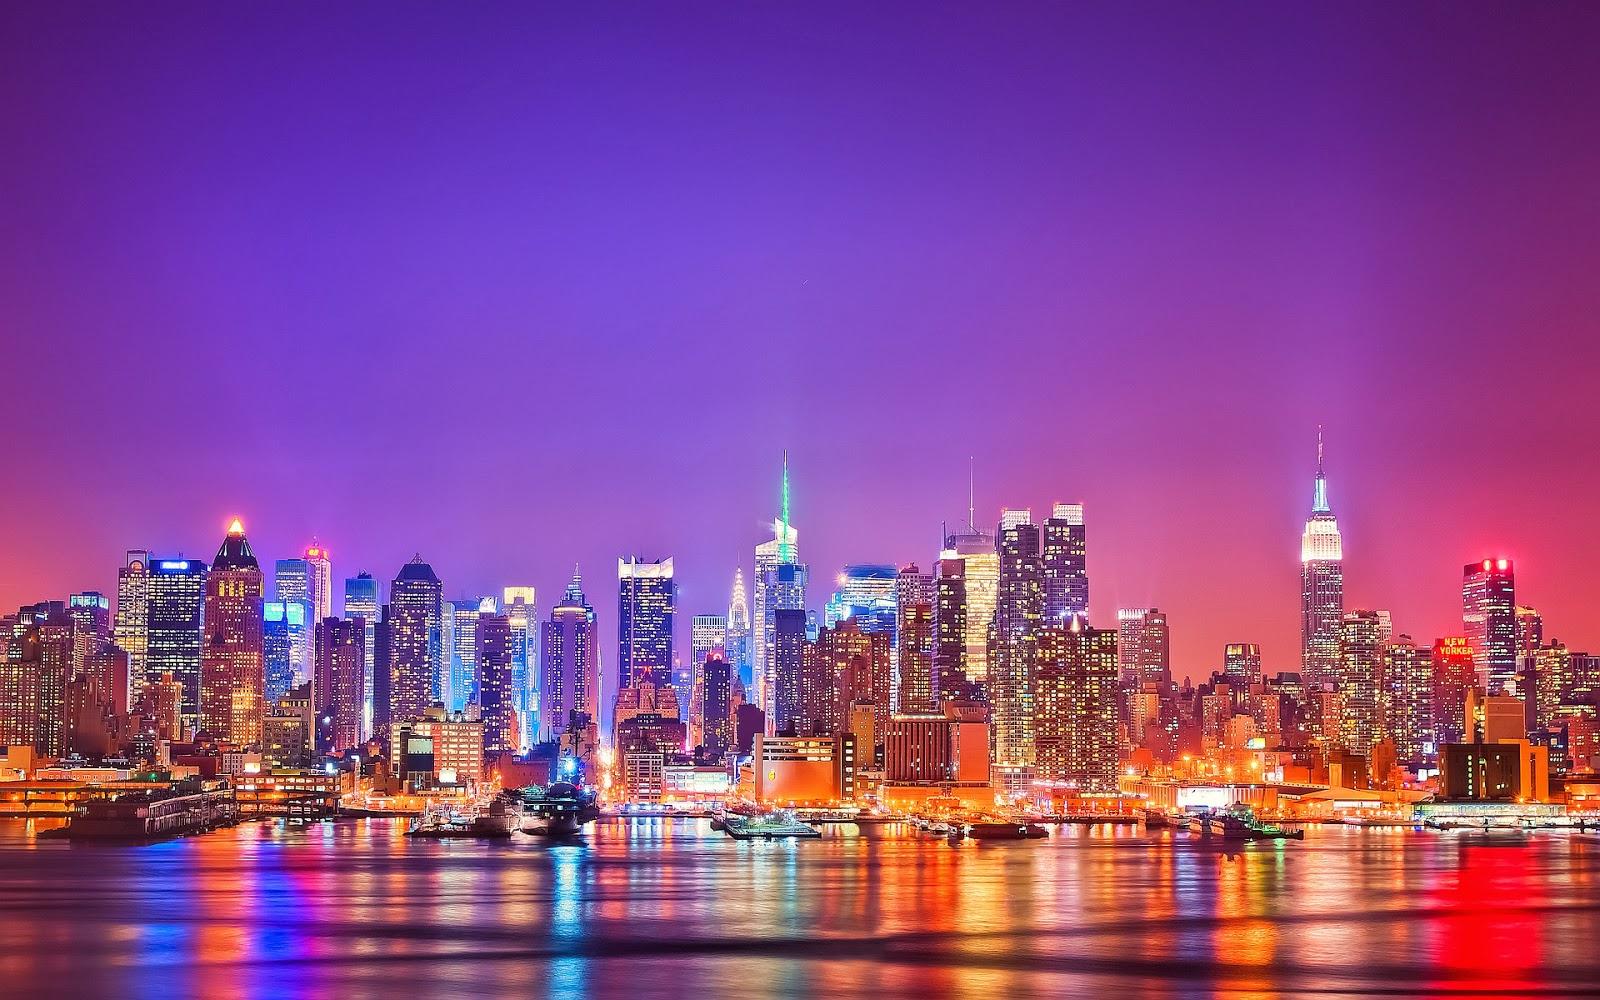 74 New York City Hd Wallpaper On Wallpapersafari